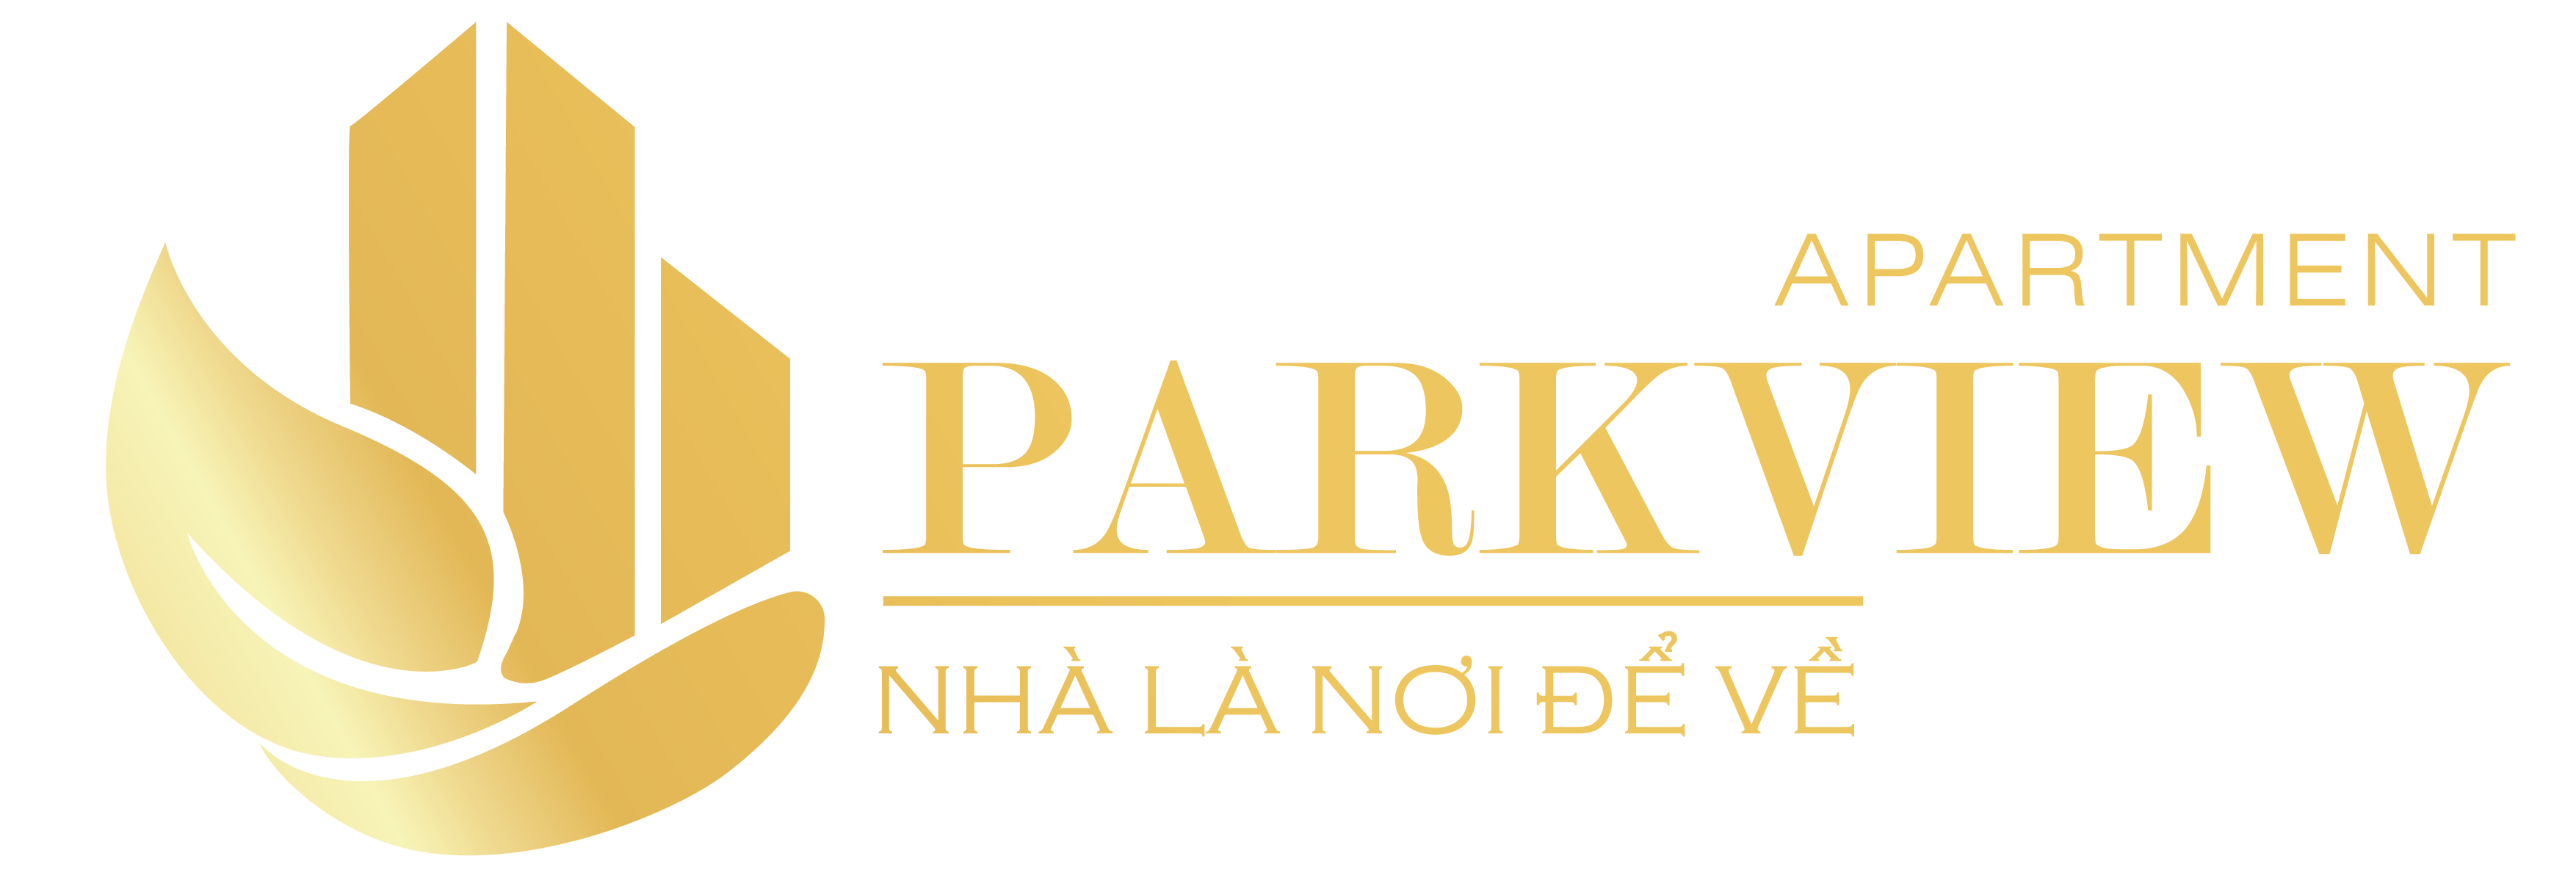 Logo parkview apartment thuận an bình dương